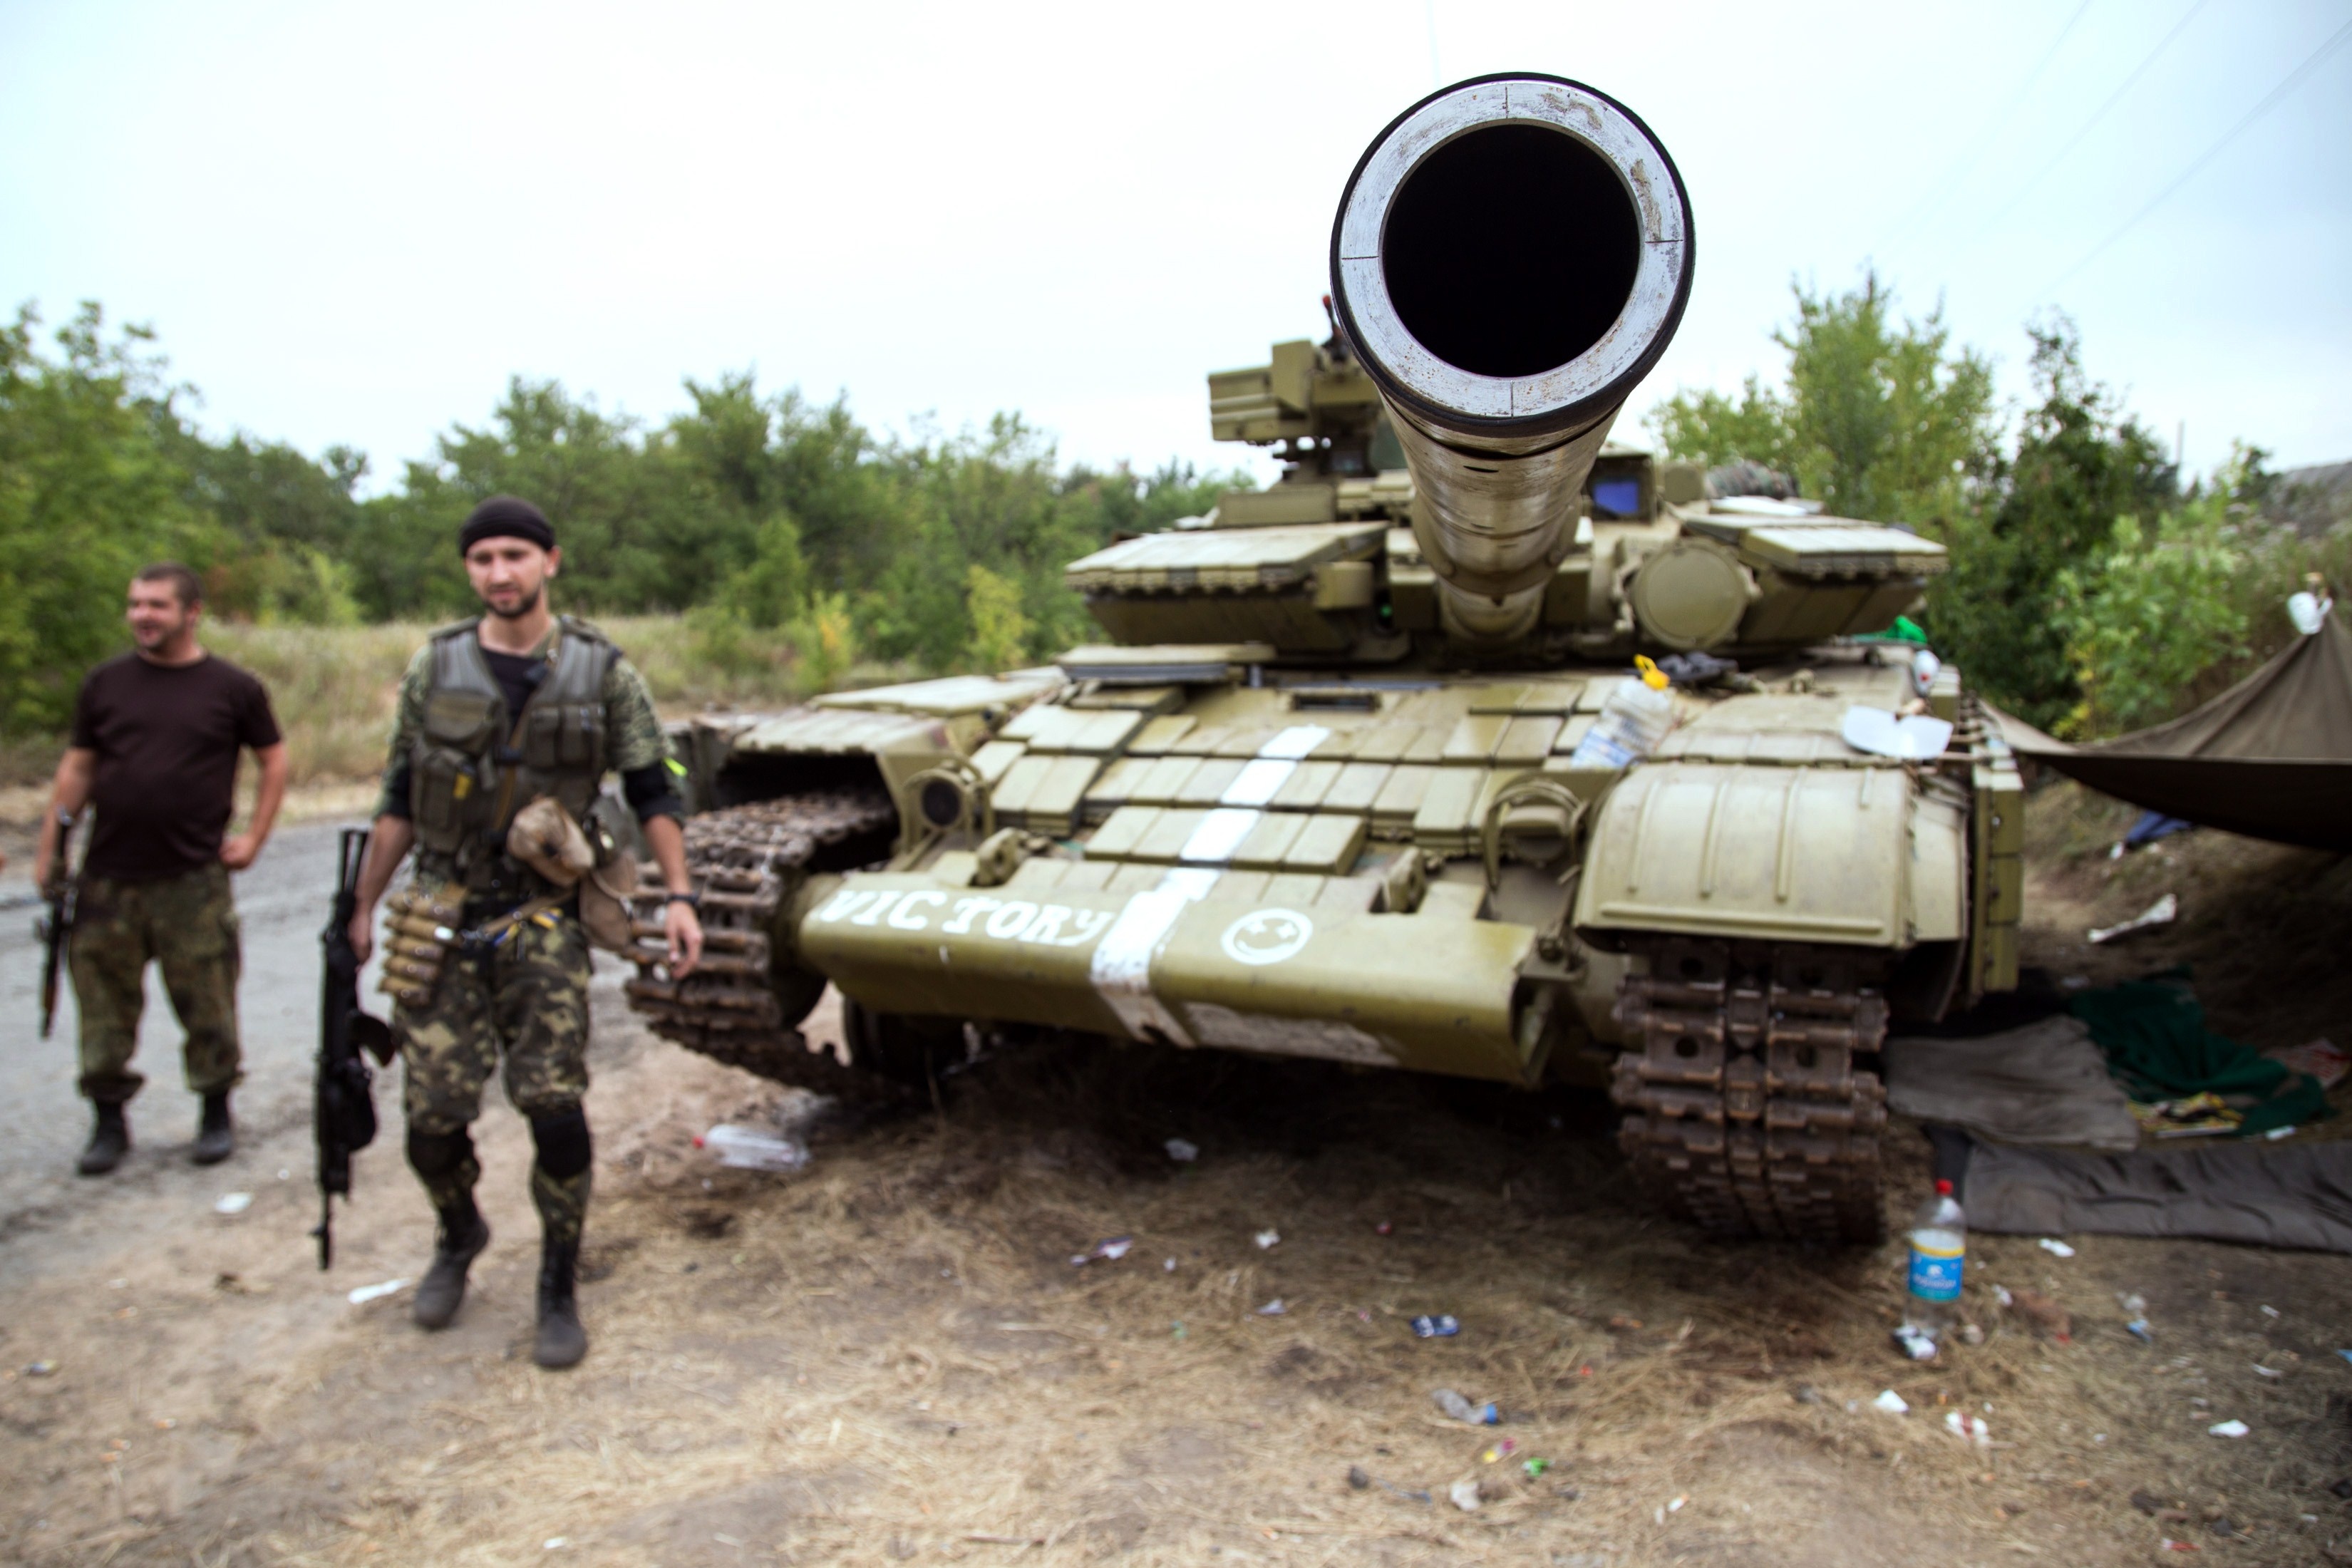 Criza in Ucraina. Batalie pentru aeroportul din Donetk. 6 civili, ucisi in confruntarile dintre armata ucraineana si rebeli